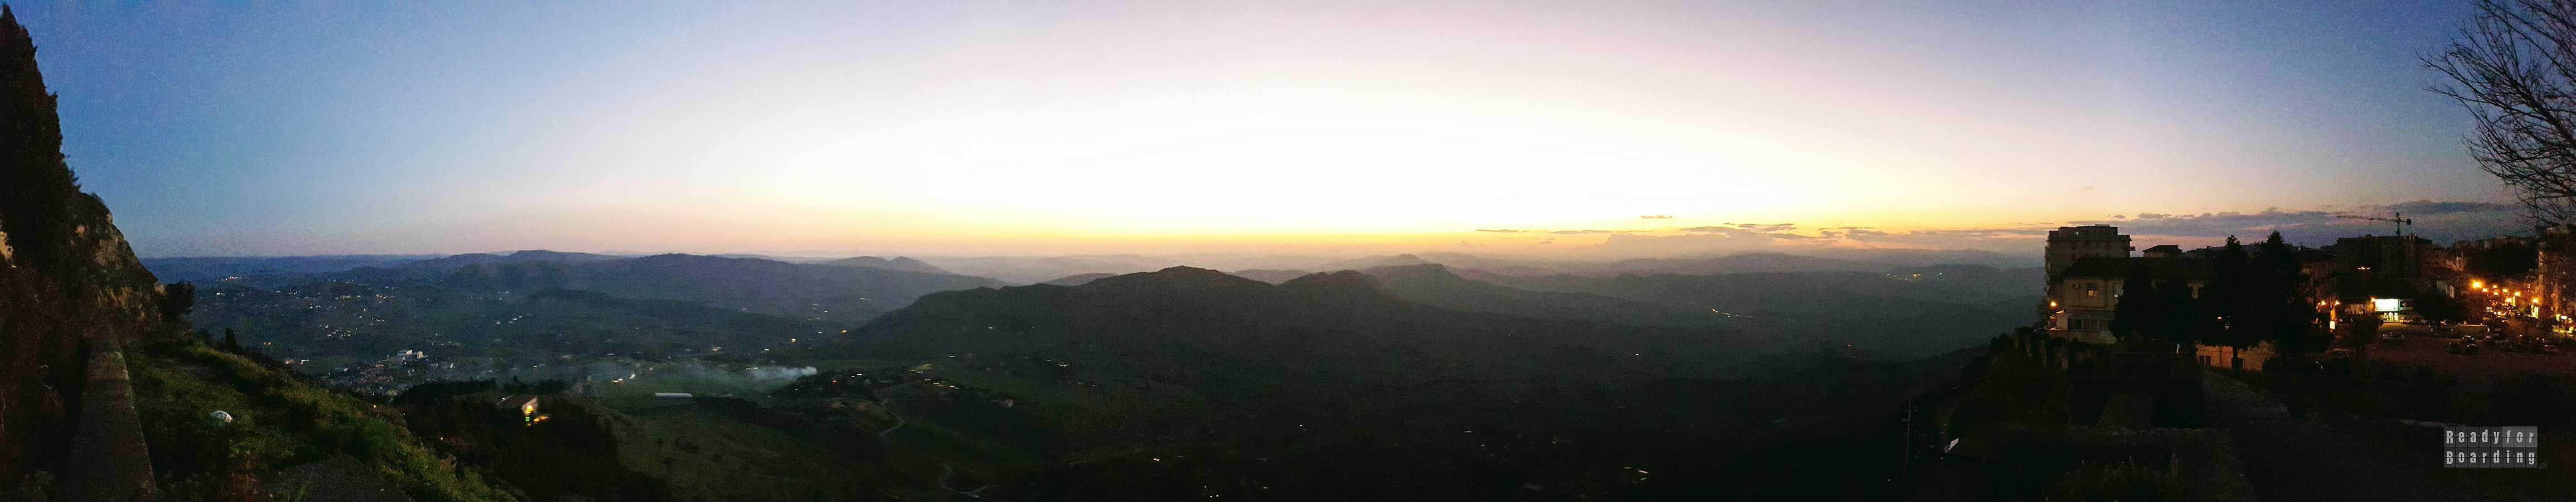 Panorama: Enna - Sycylia